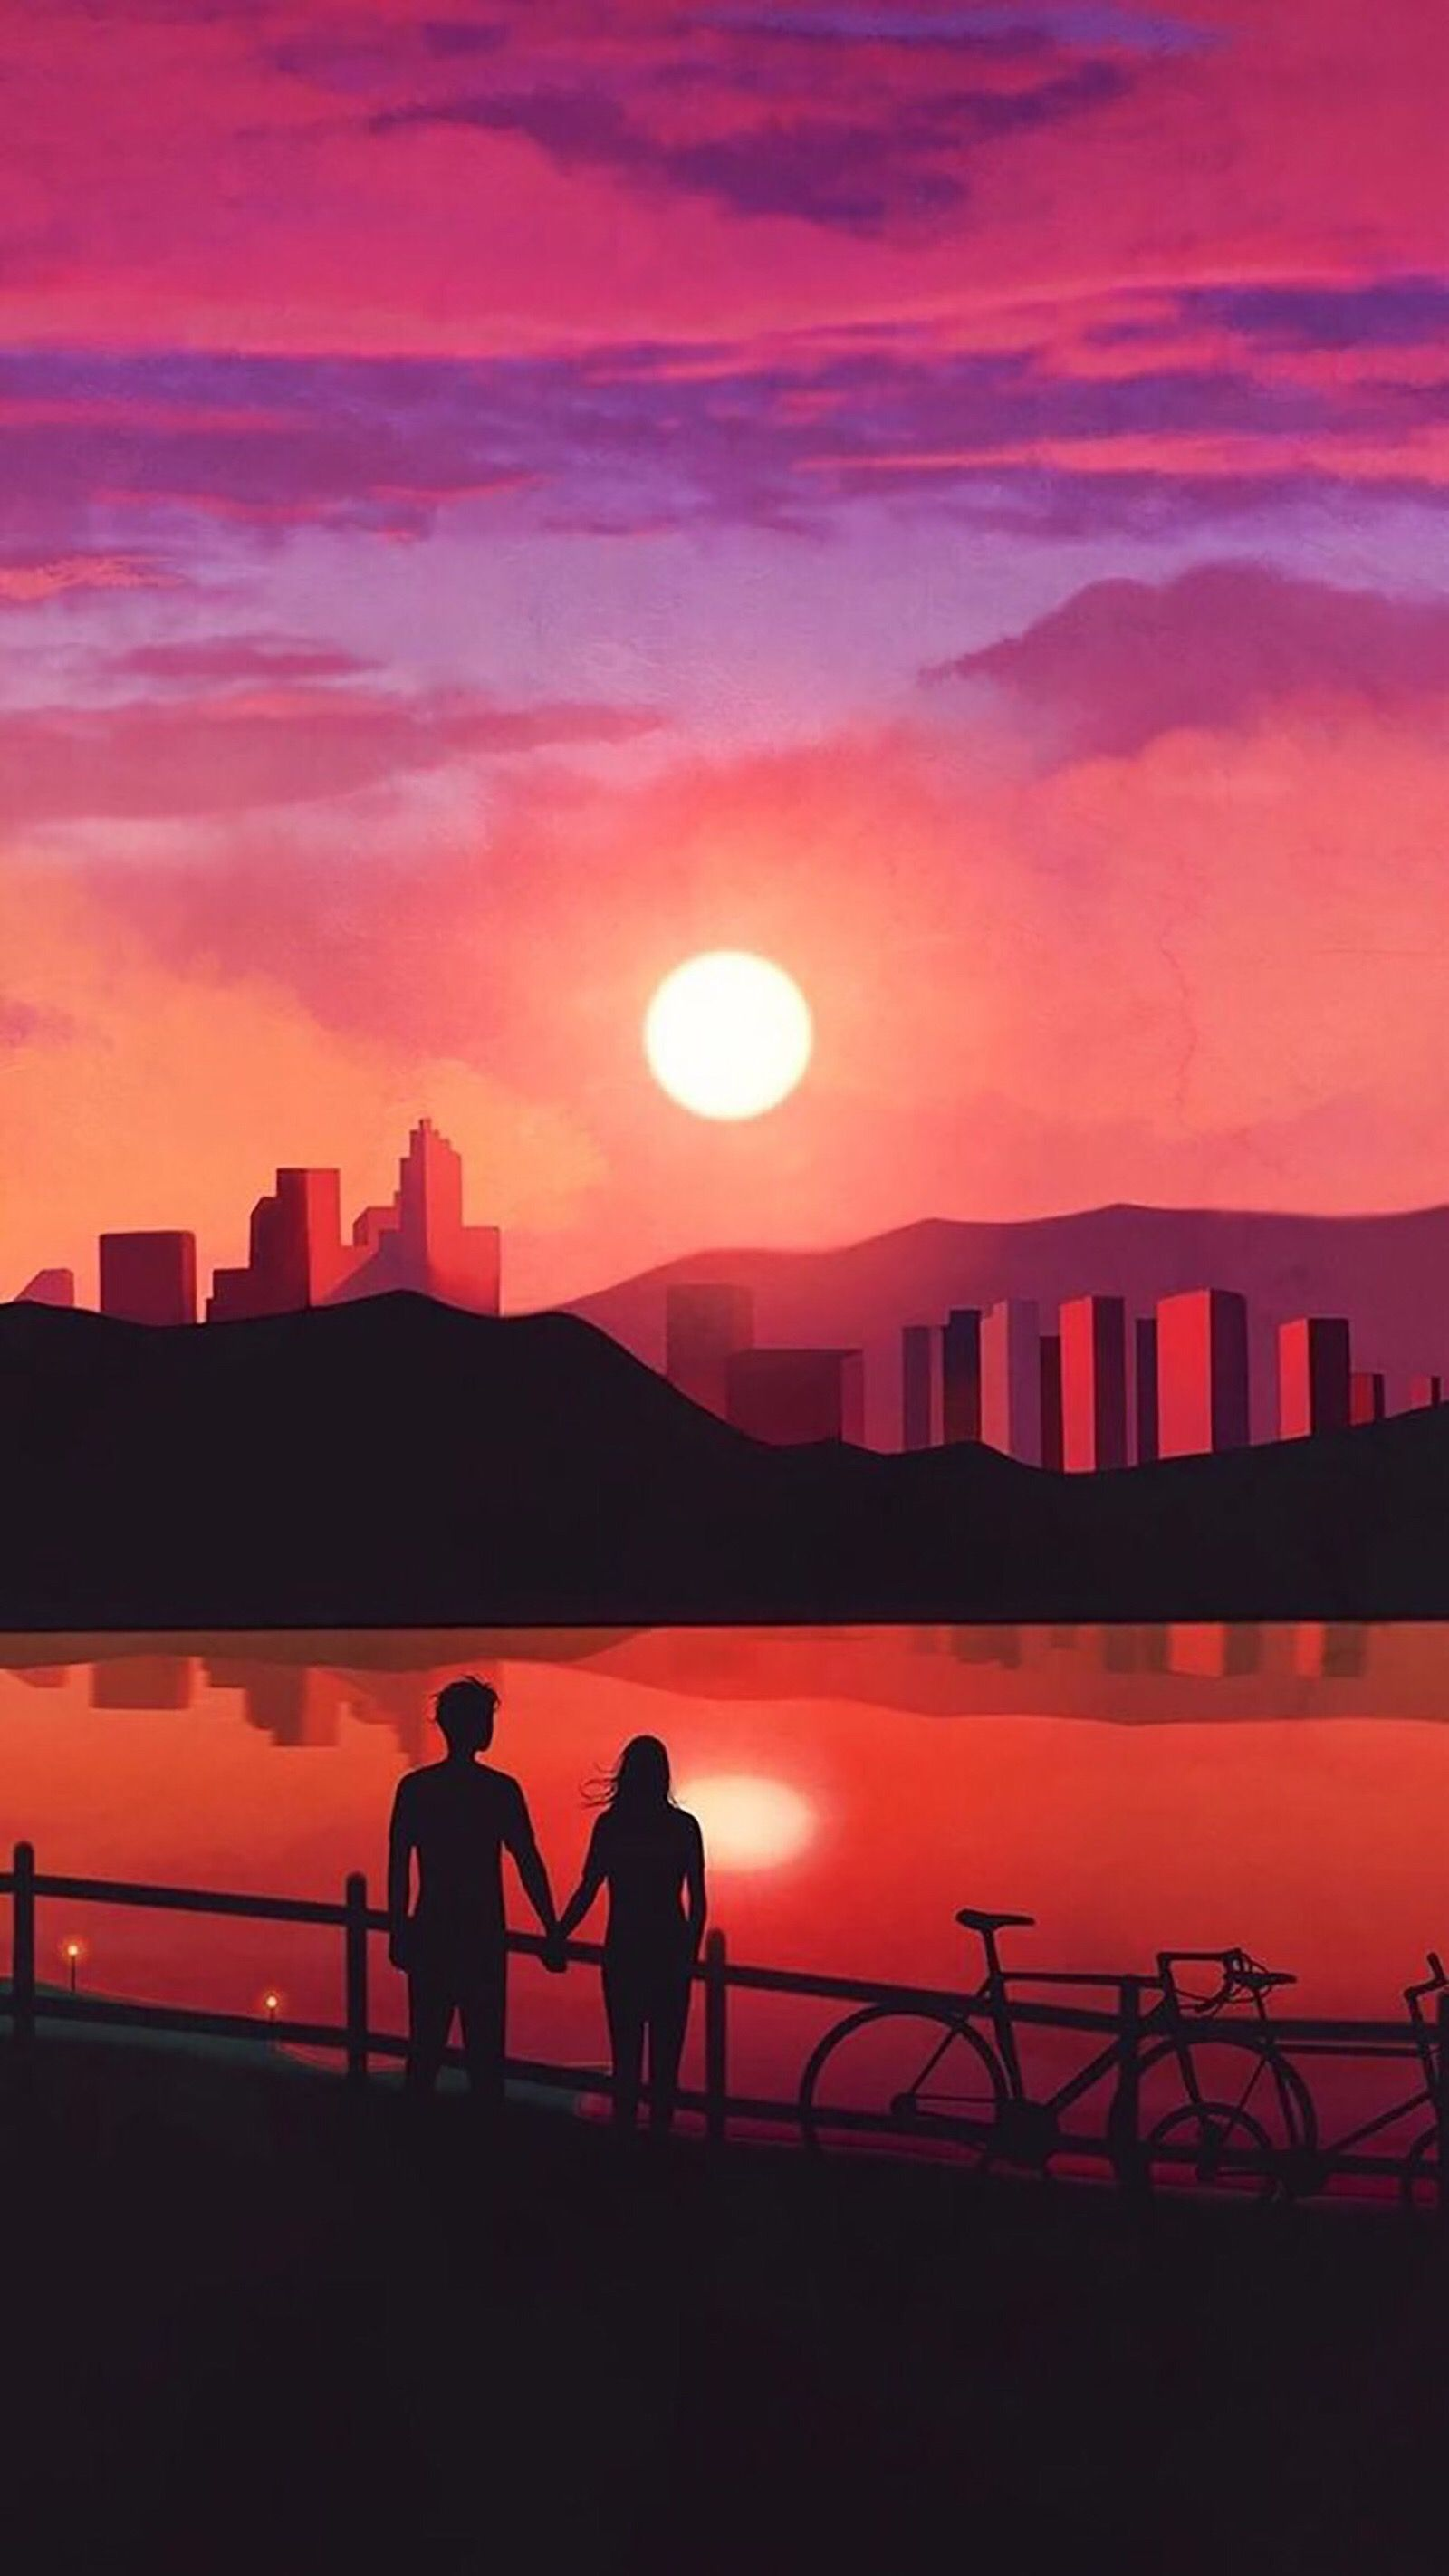 Love Alone Aesthetic Art Anime Scenery Cute Couple Drawings